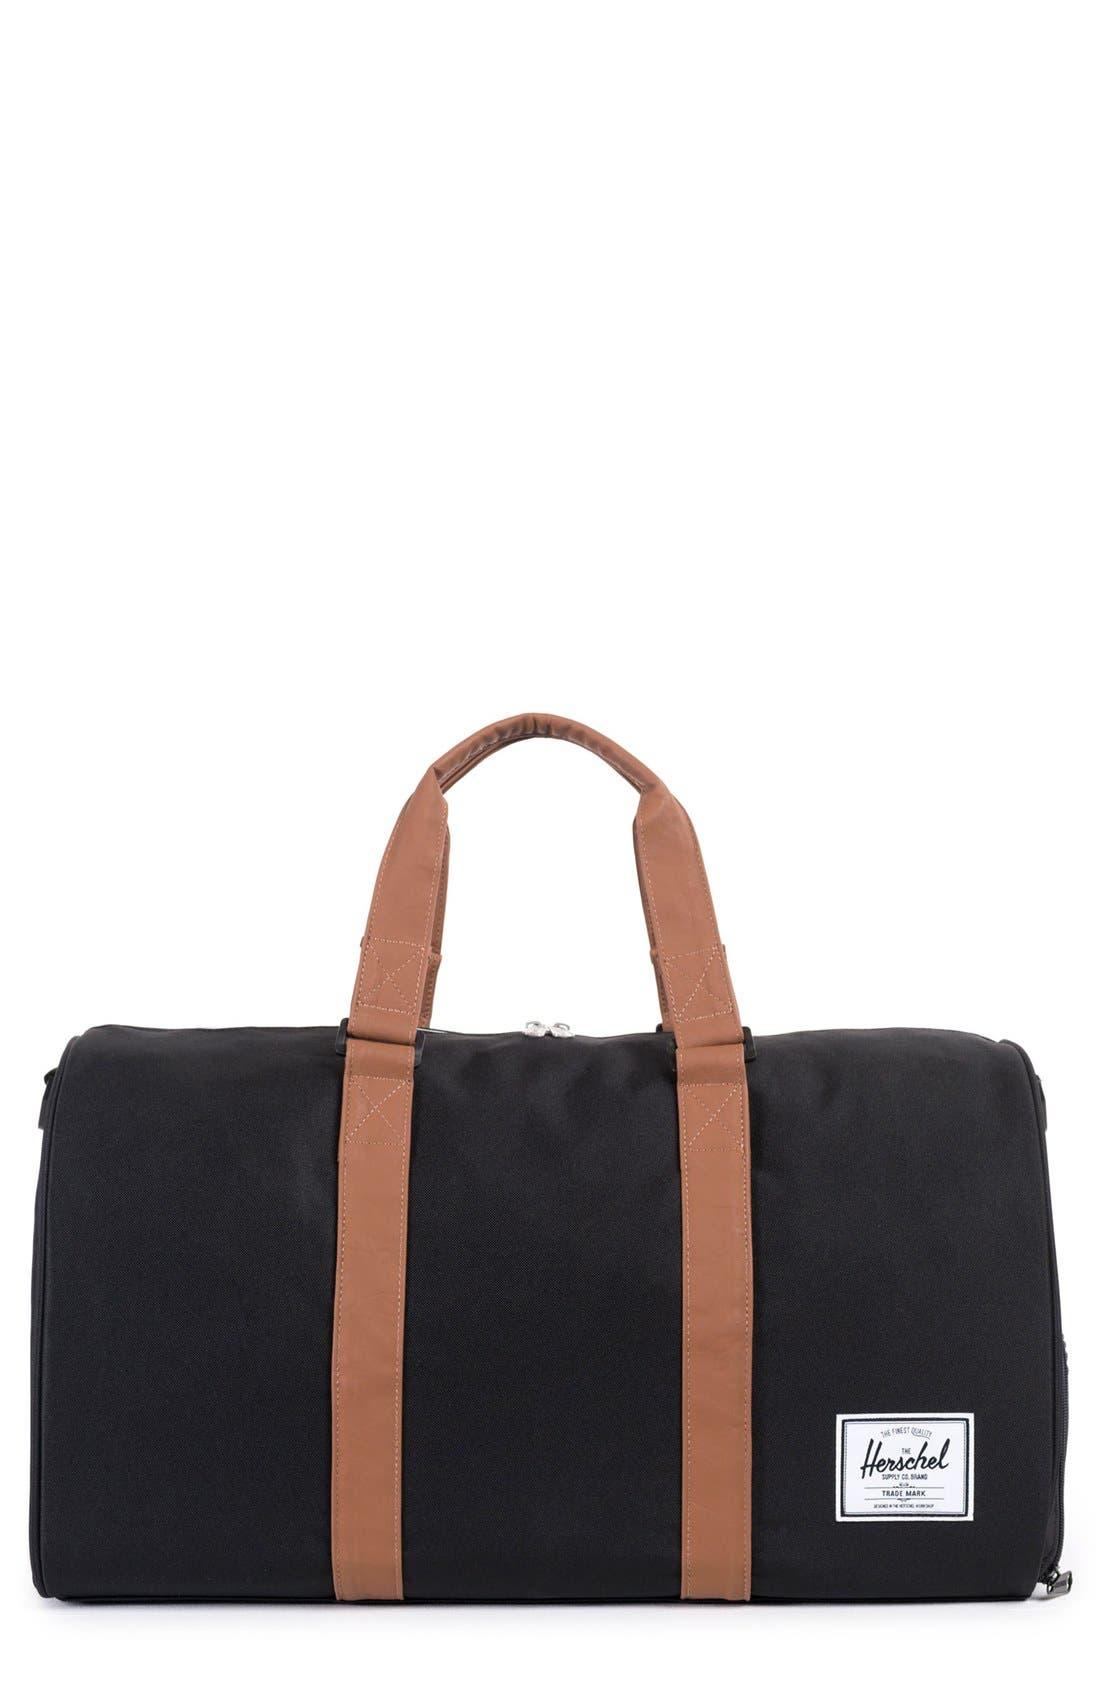 'Novel' Duffel Bag,                             Main thumbnail 1, color,                             BLACK/ TAN